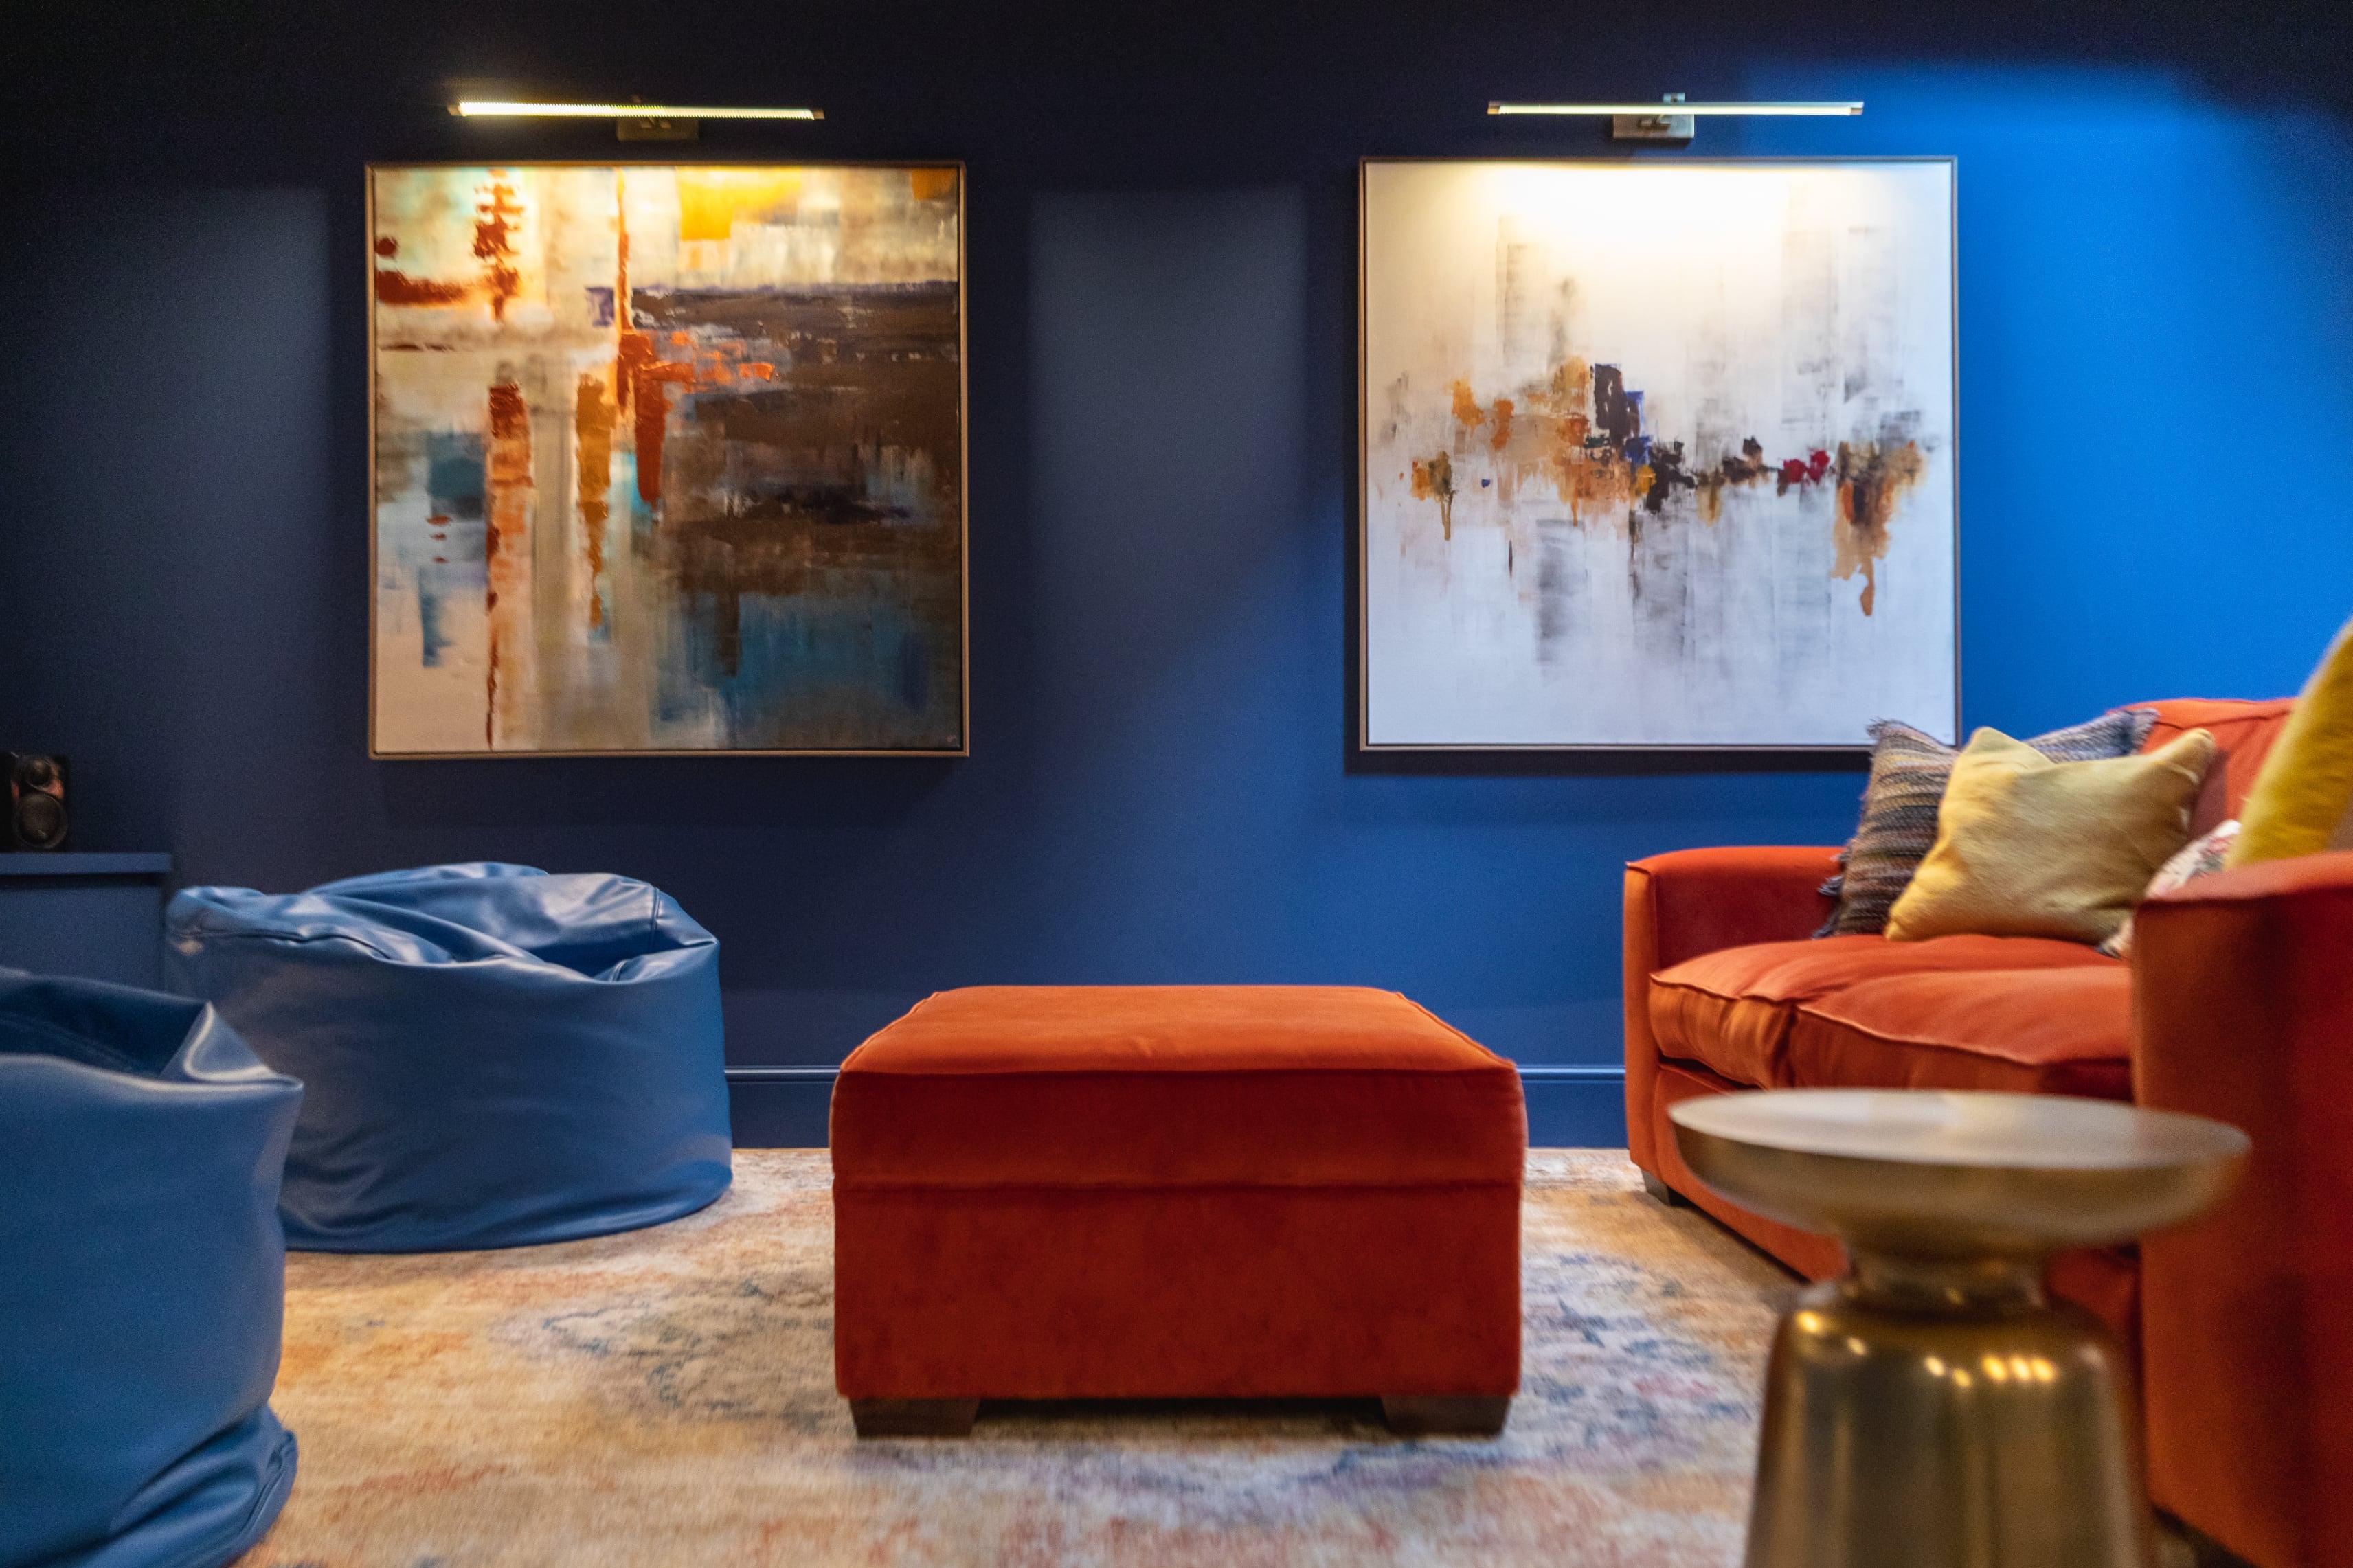 Basement interior design with blue walls and orange sofa